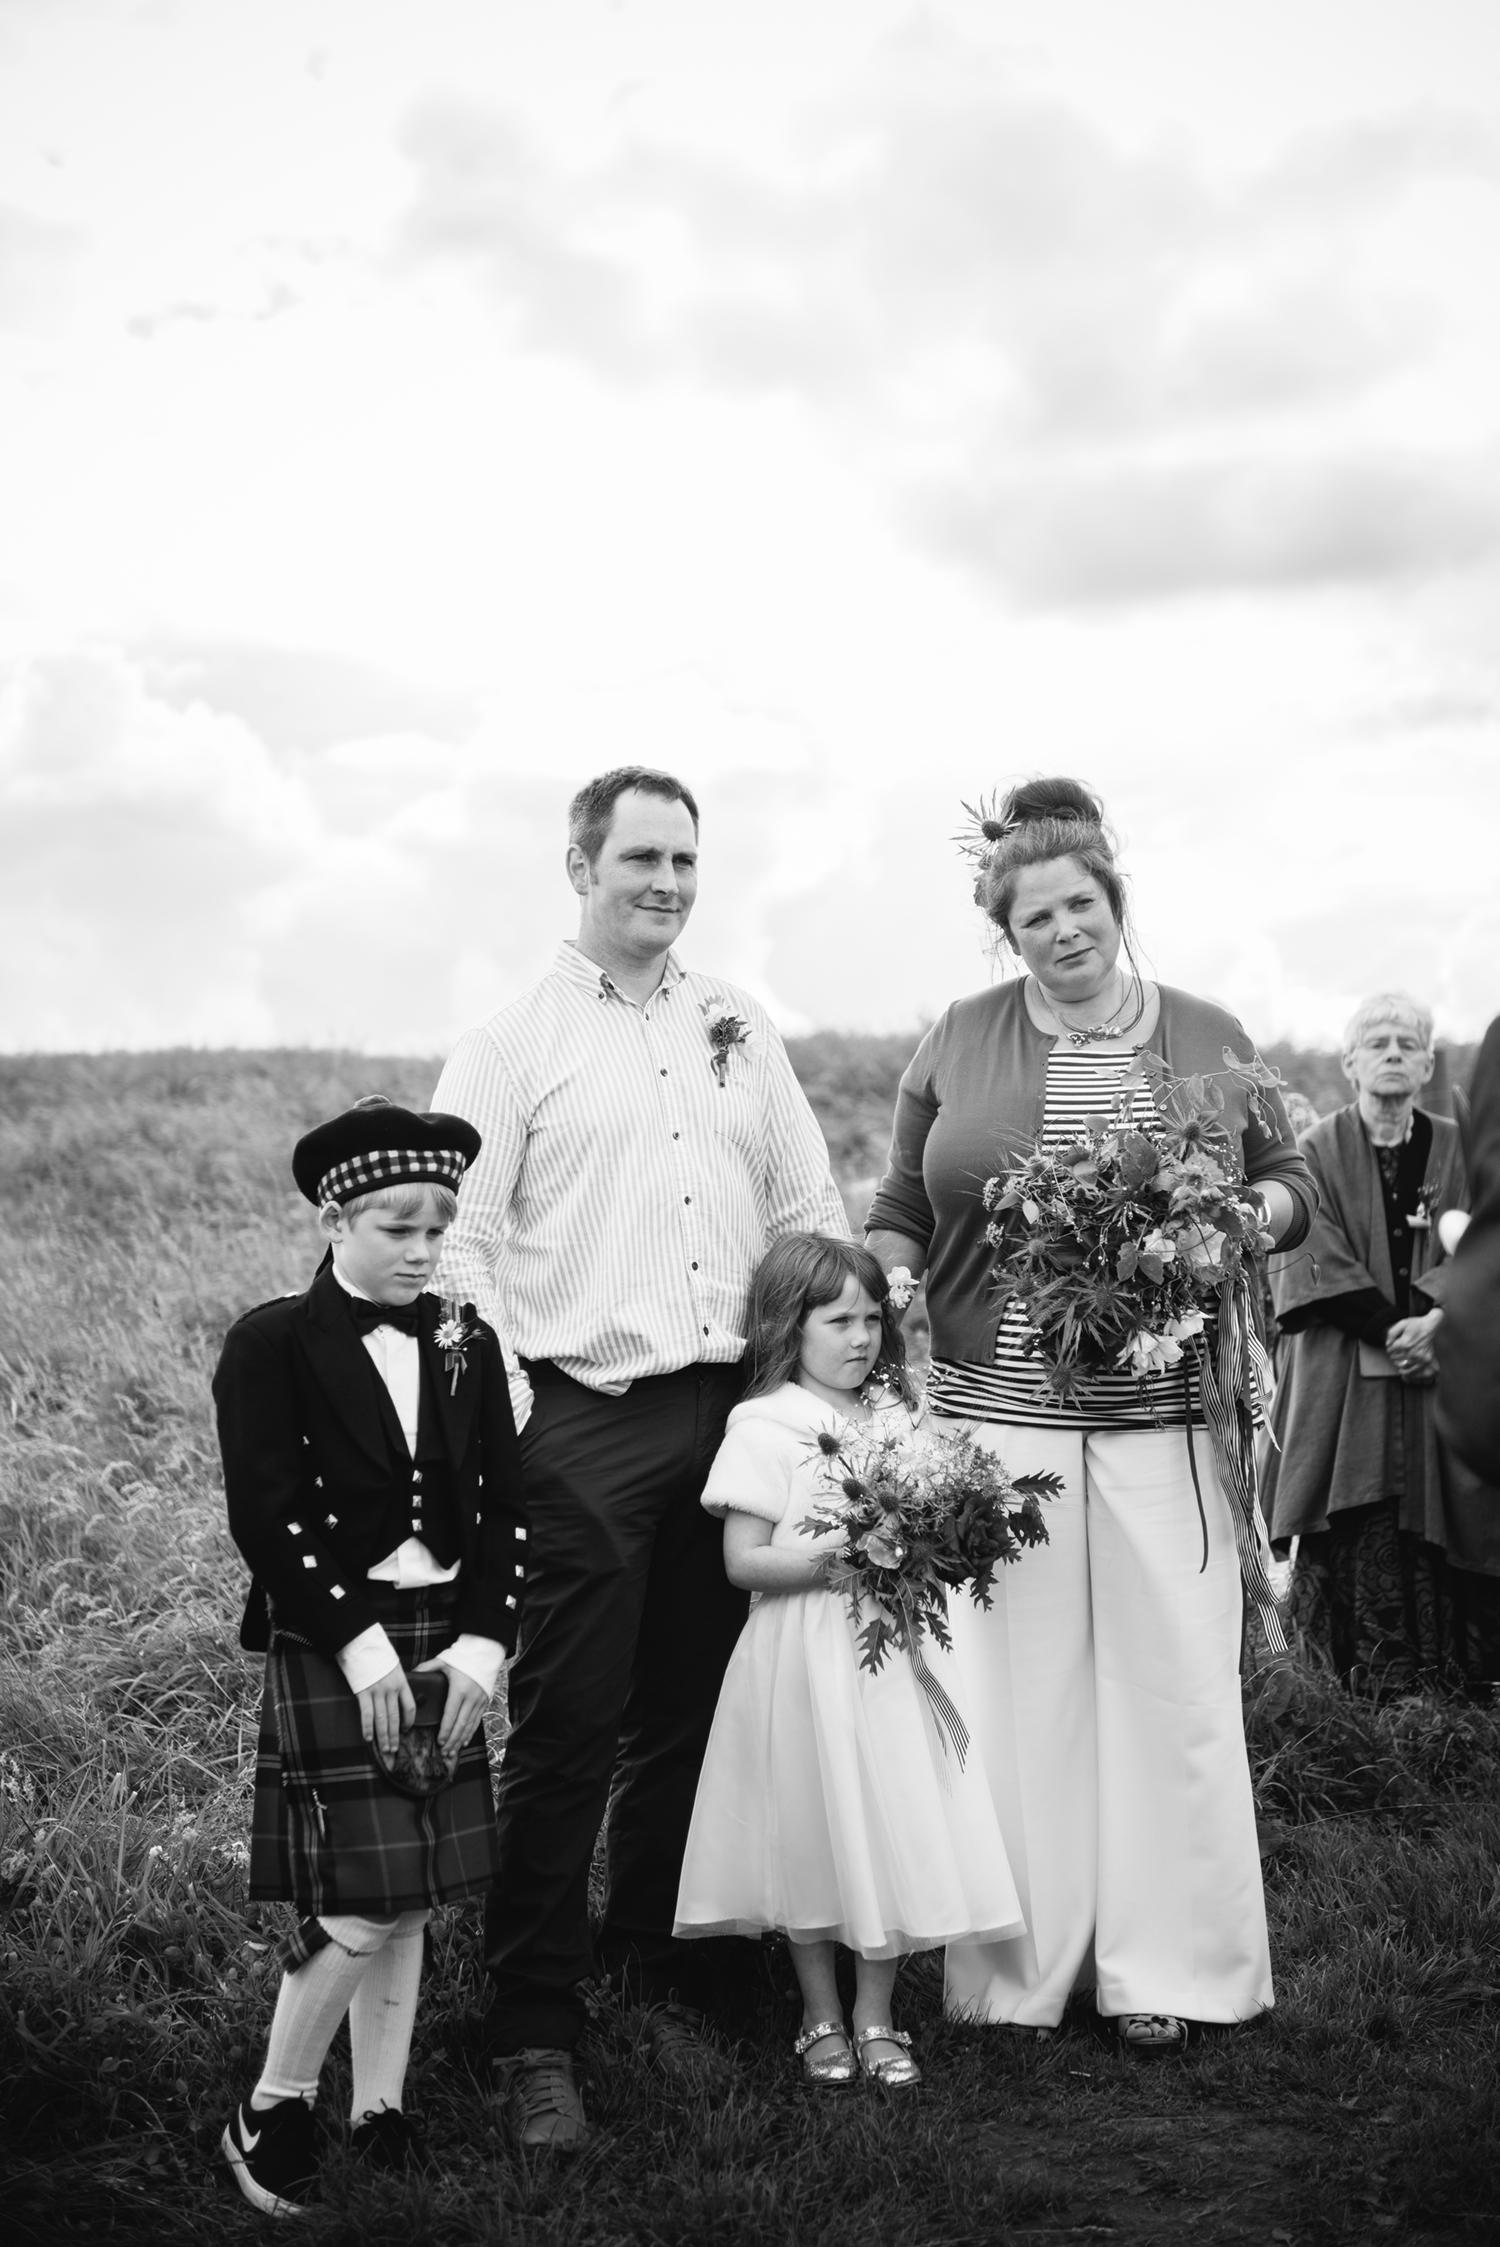 Cliff-top-wedding-scotland-0110.jpg